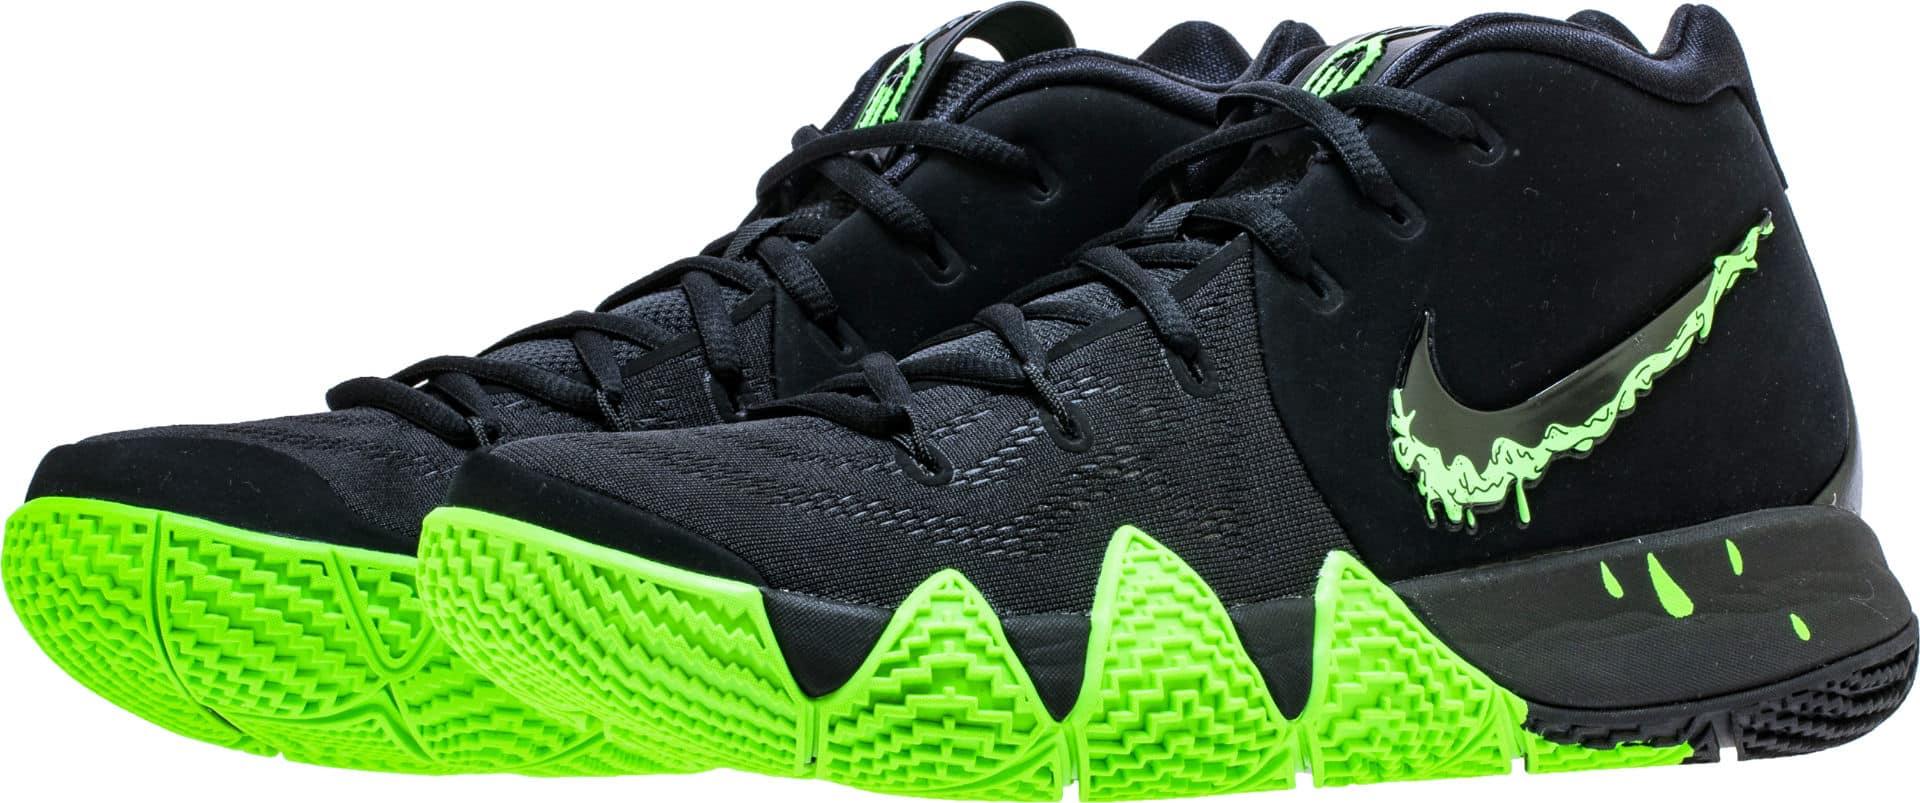 84a61add24b Kicks   Les Nike Kyrie 4 « Halloween »